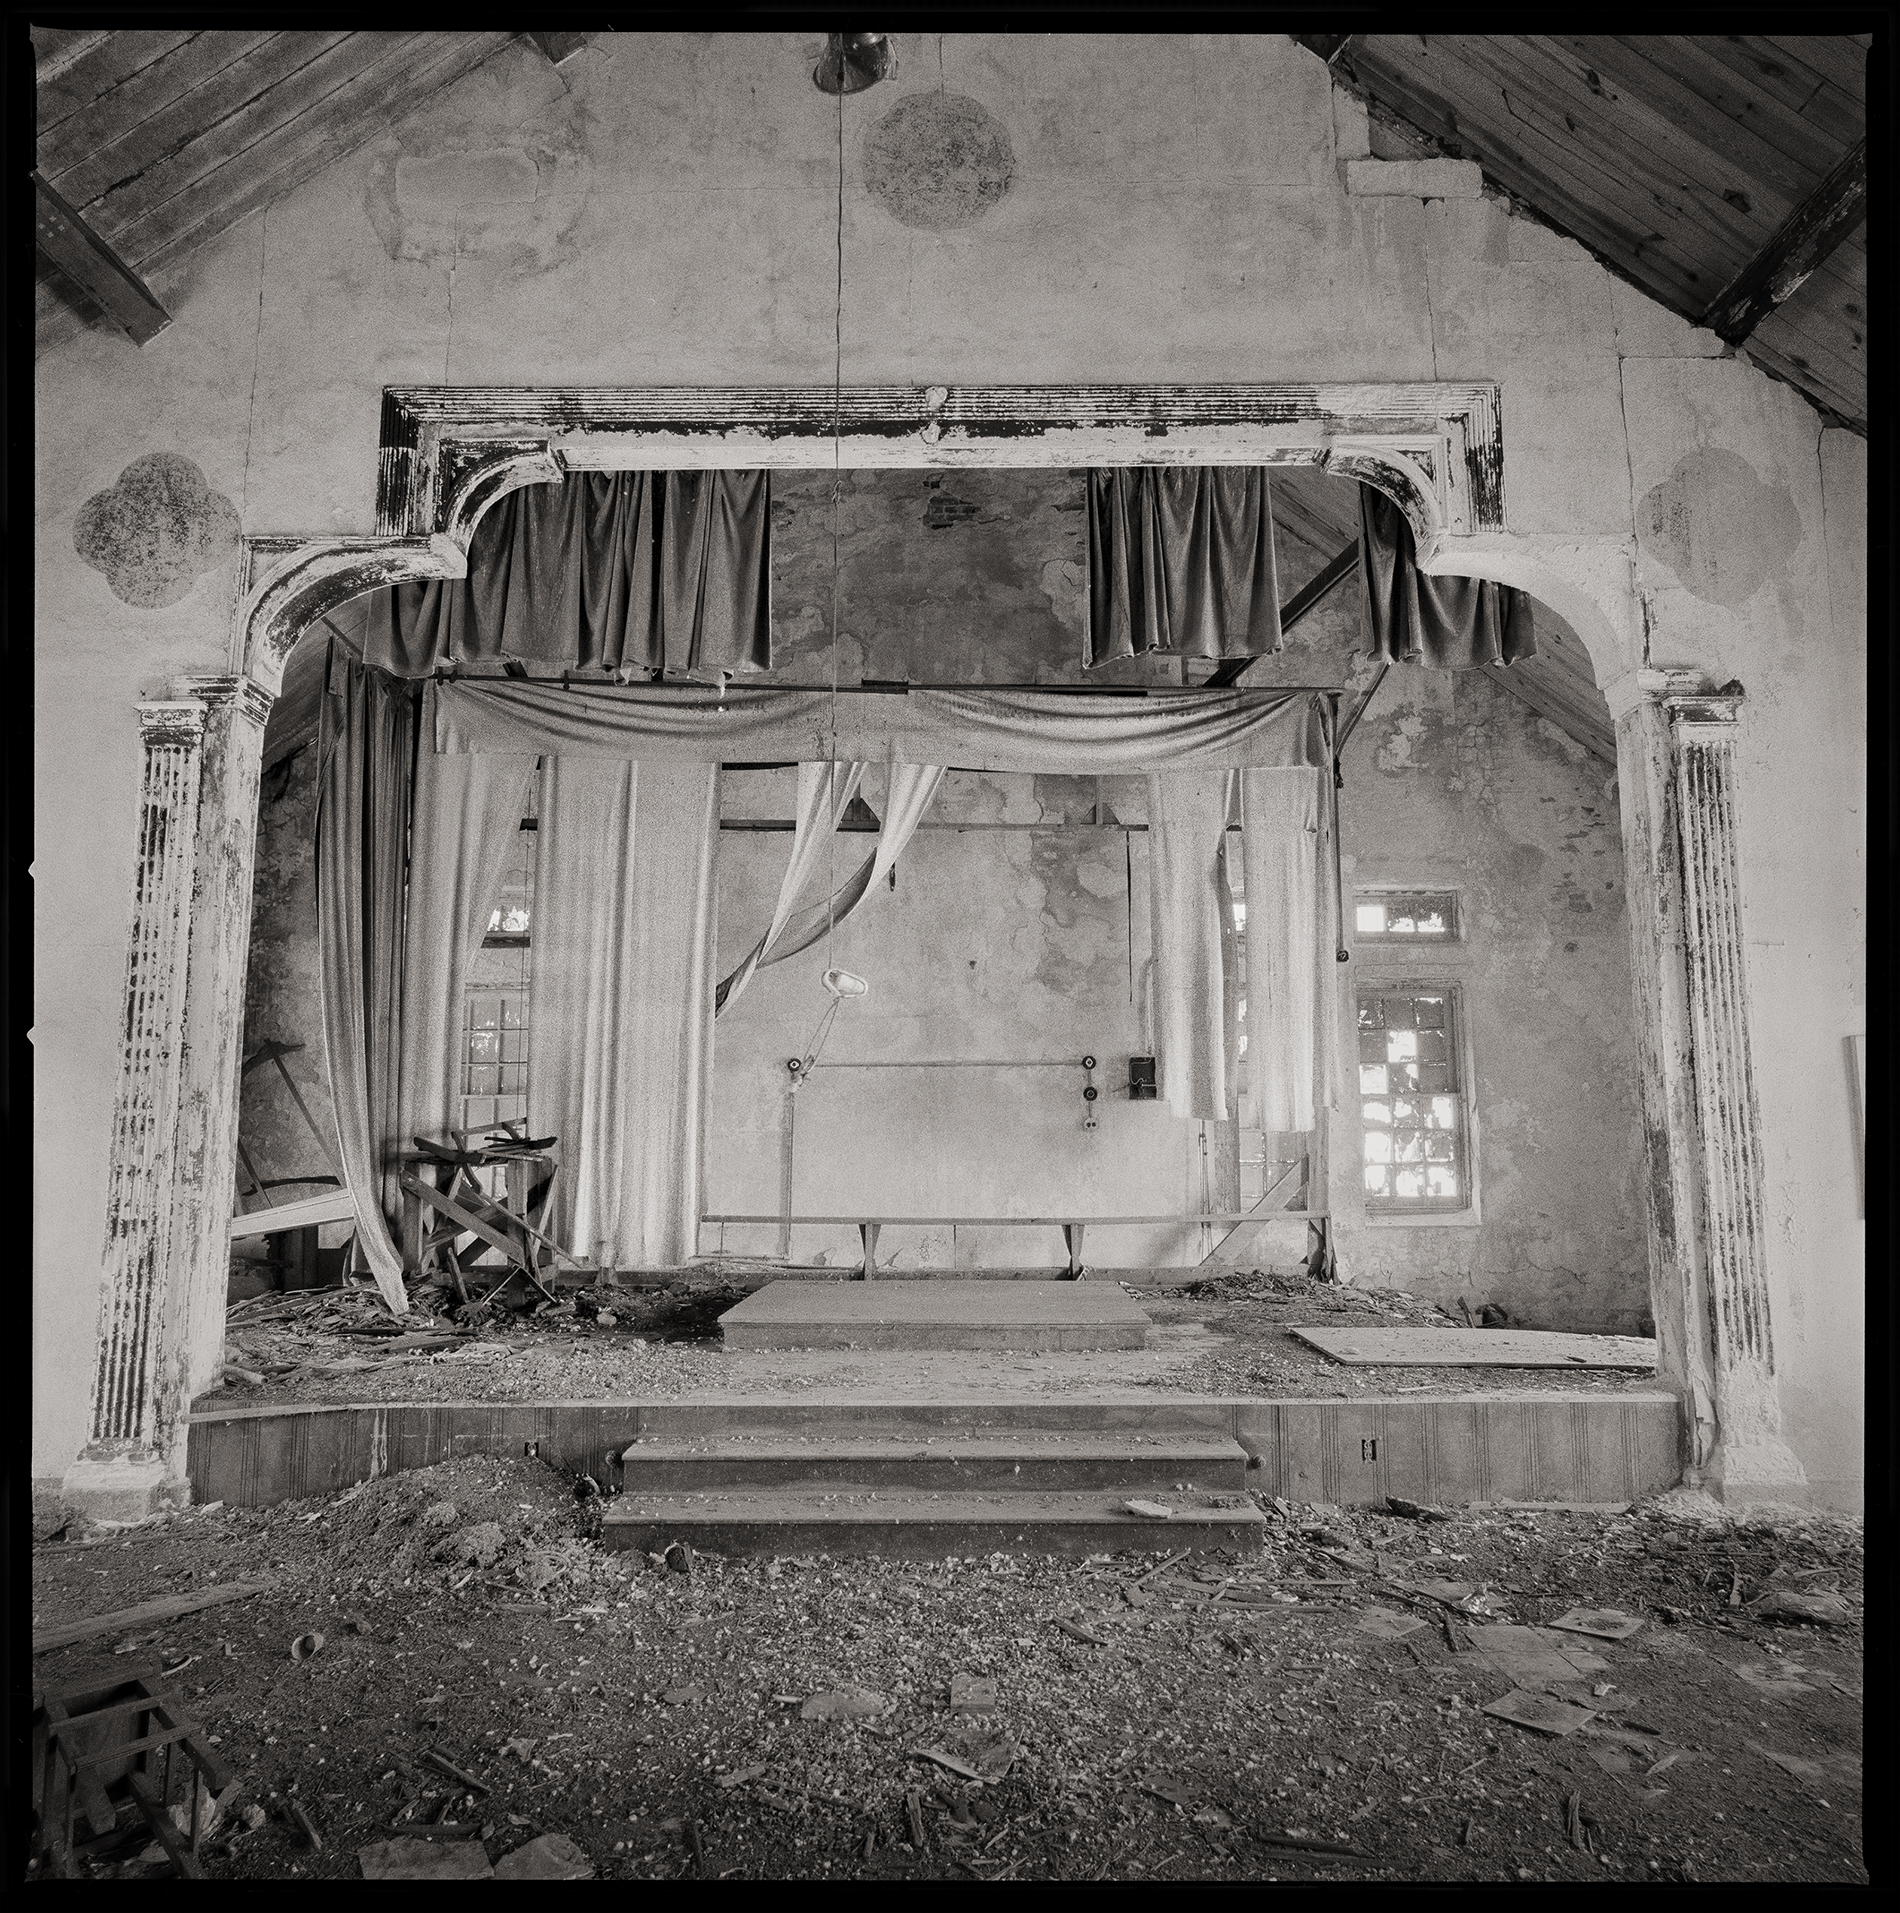 Chapel & Theater